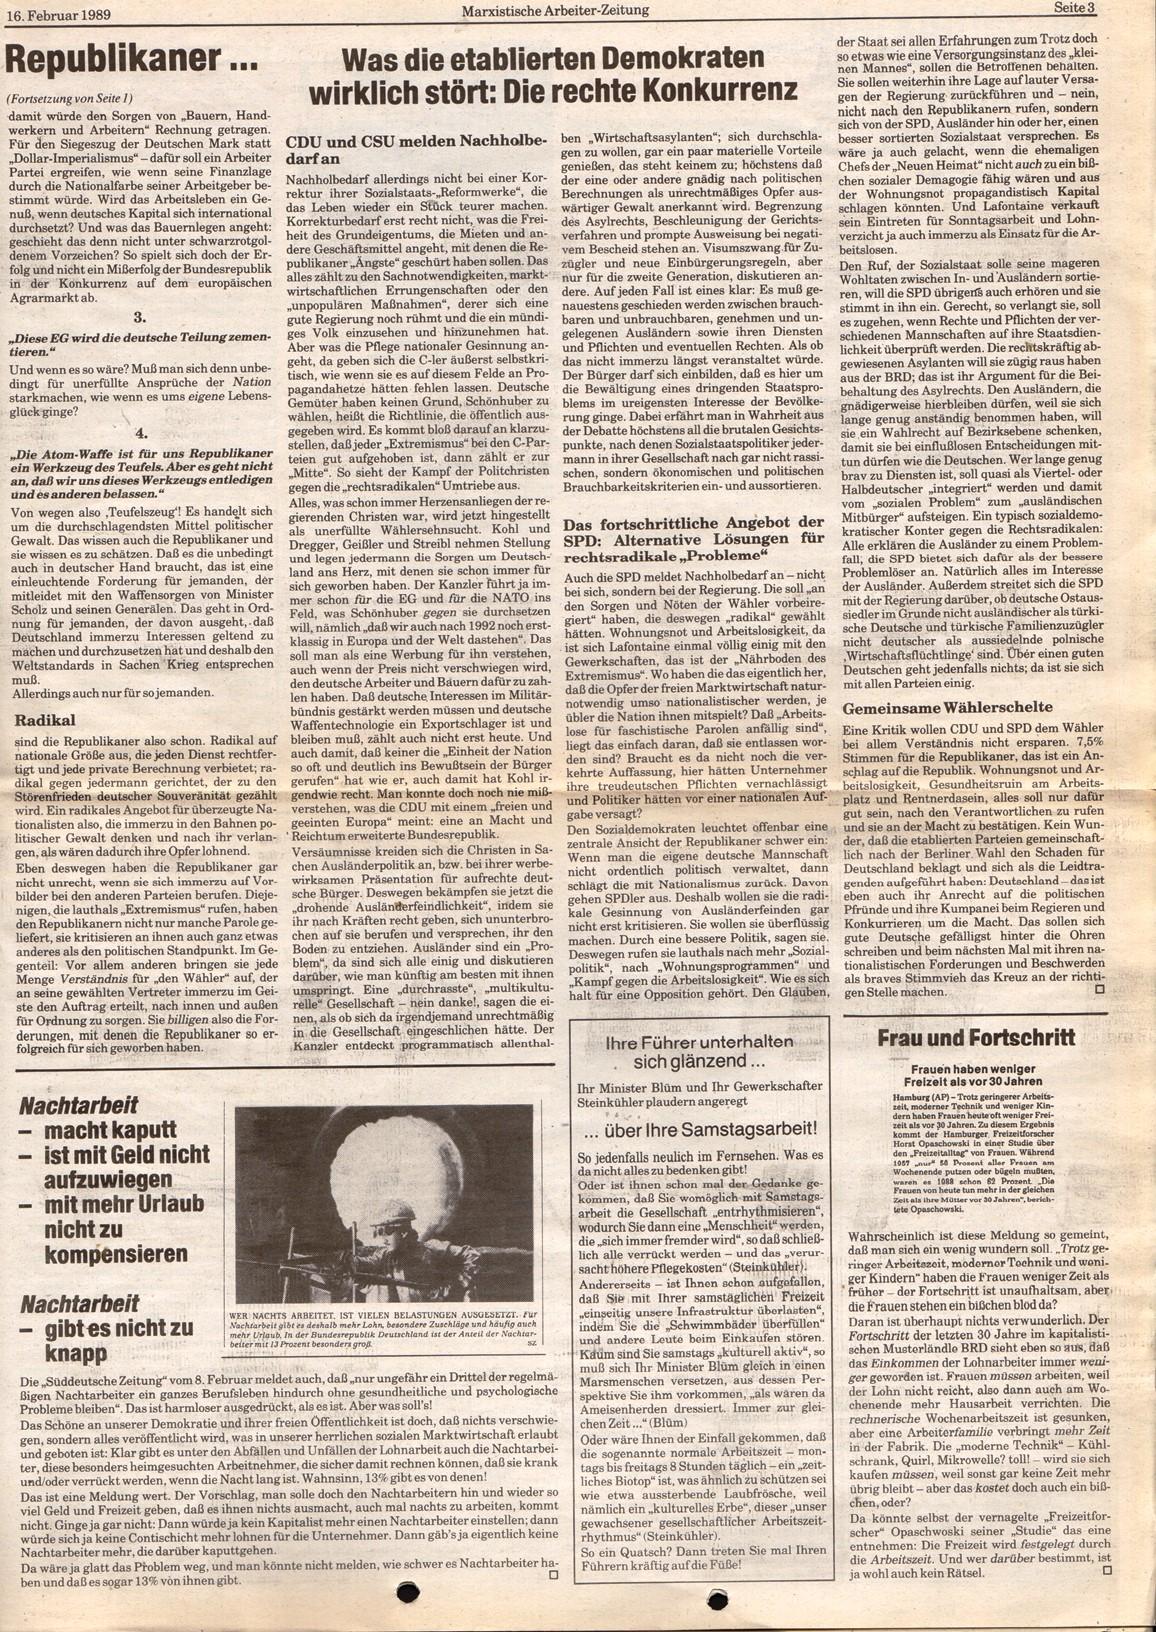 Muenchen_MG_MAZ_19890216_03